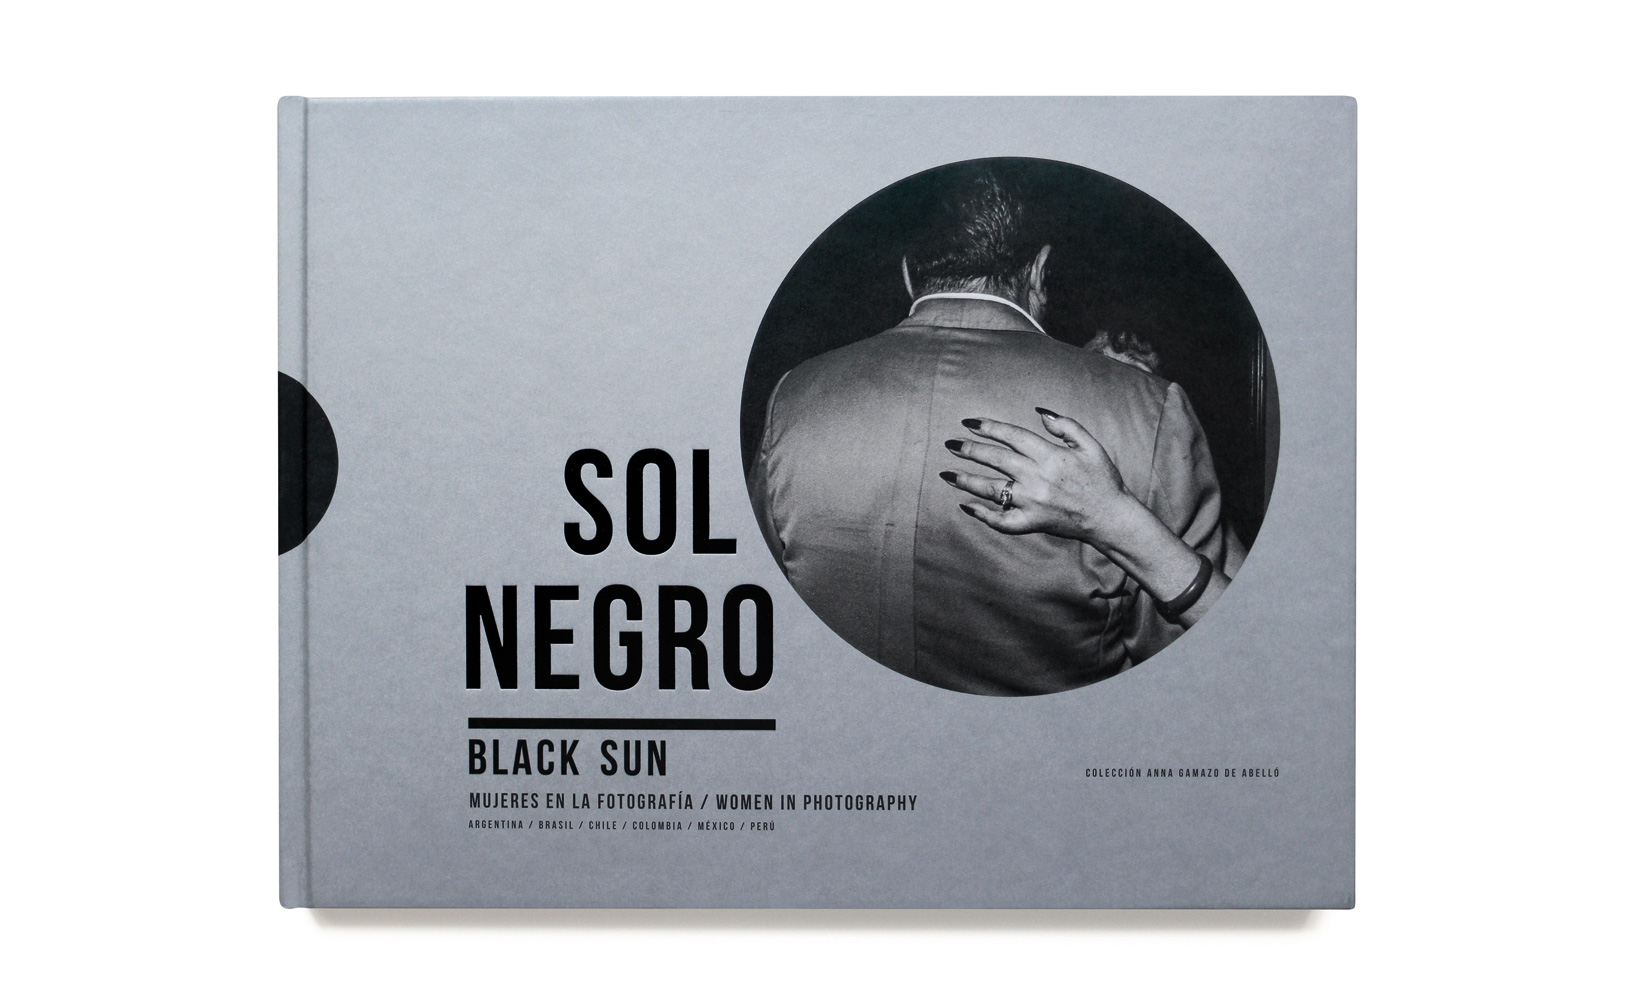 SOL-NEGRO-TOLUCA-STUDIO-OLIVIER-ANDREOTTI-02.jpg